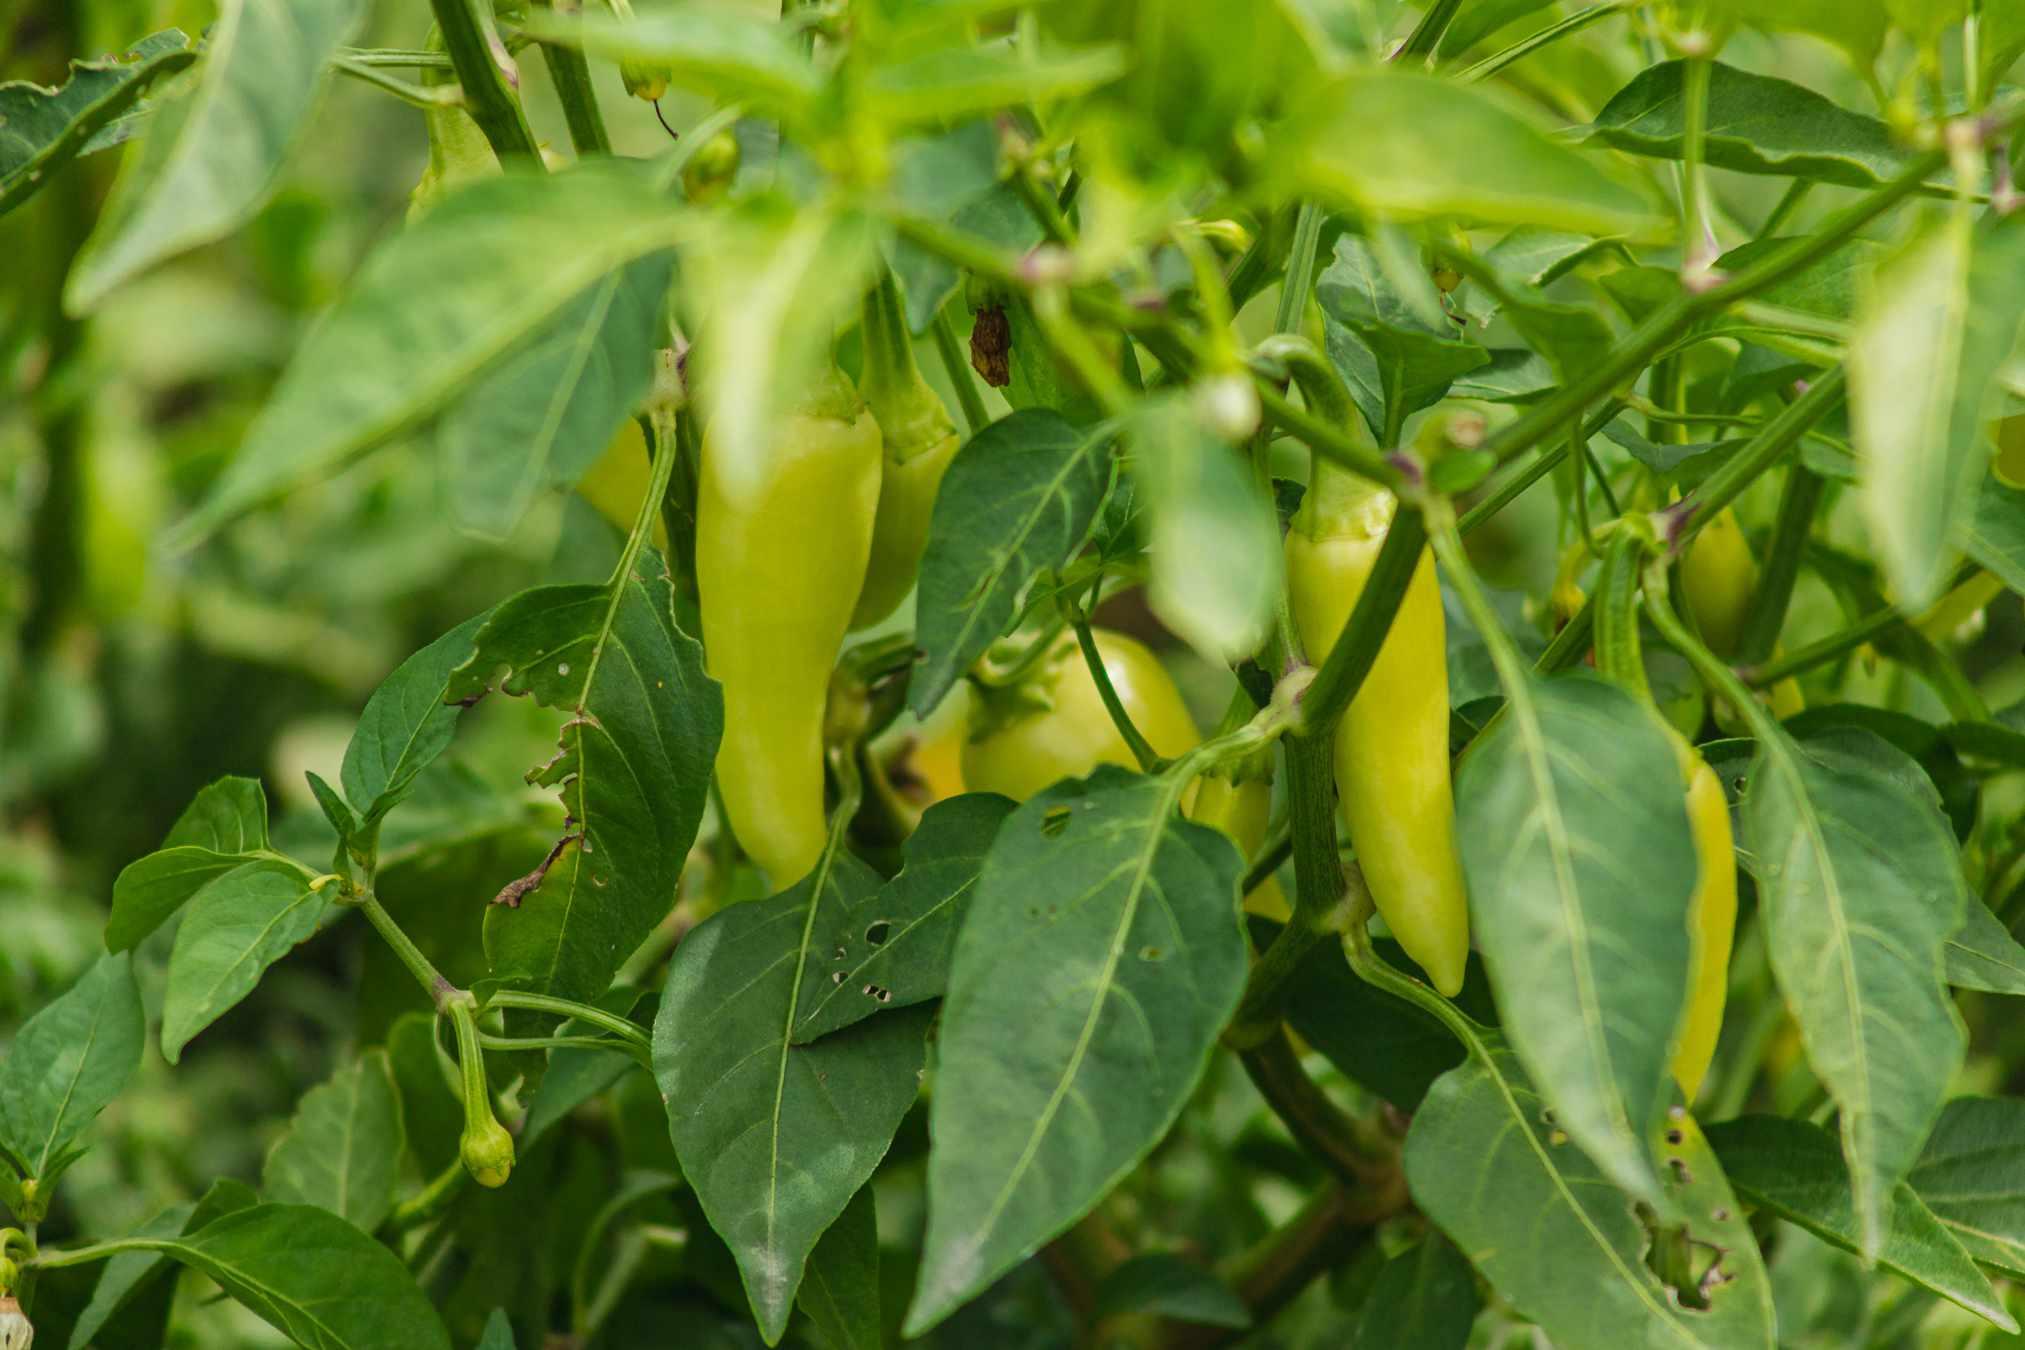 jalapeño peppers growing